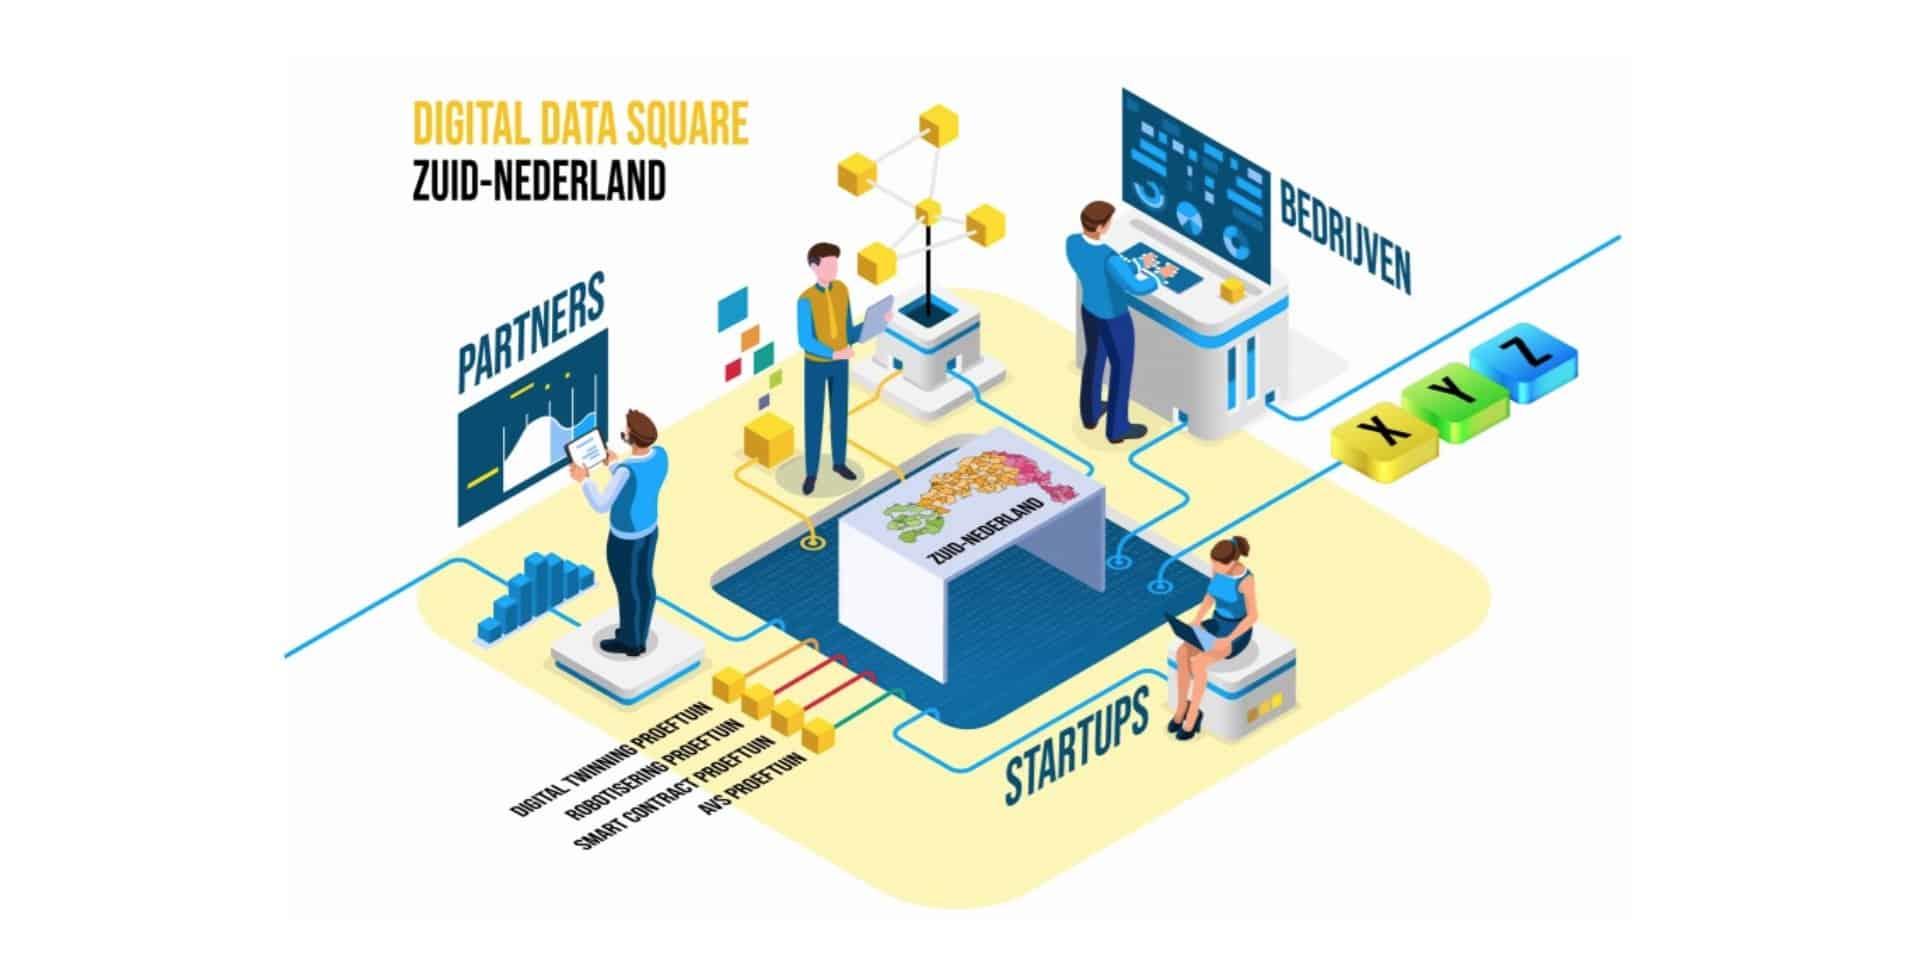 digital data square